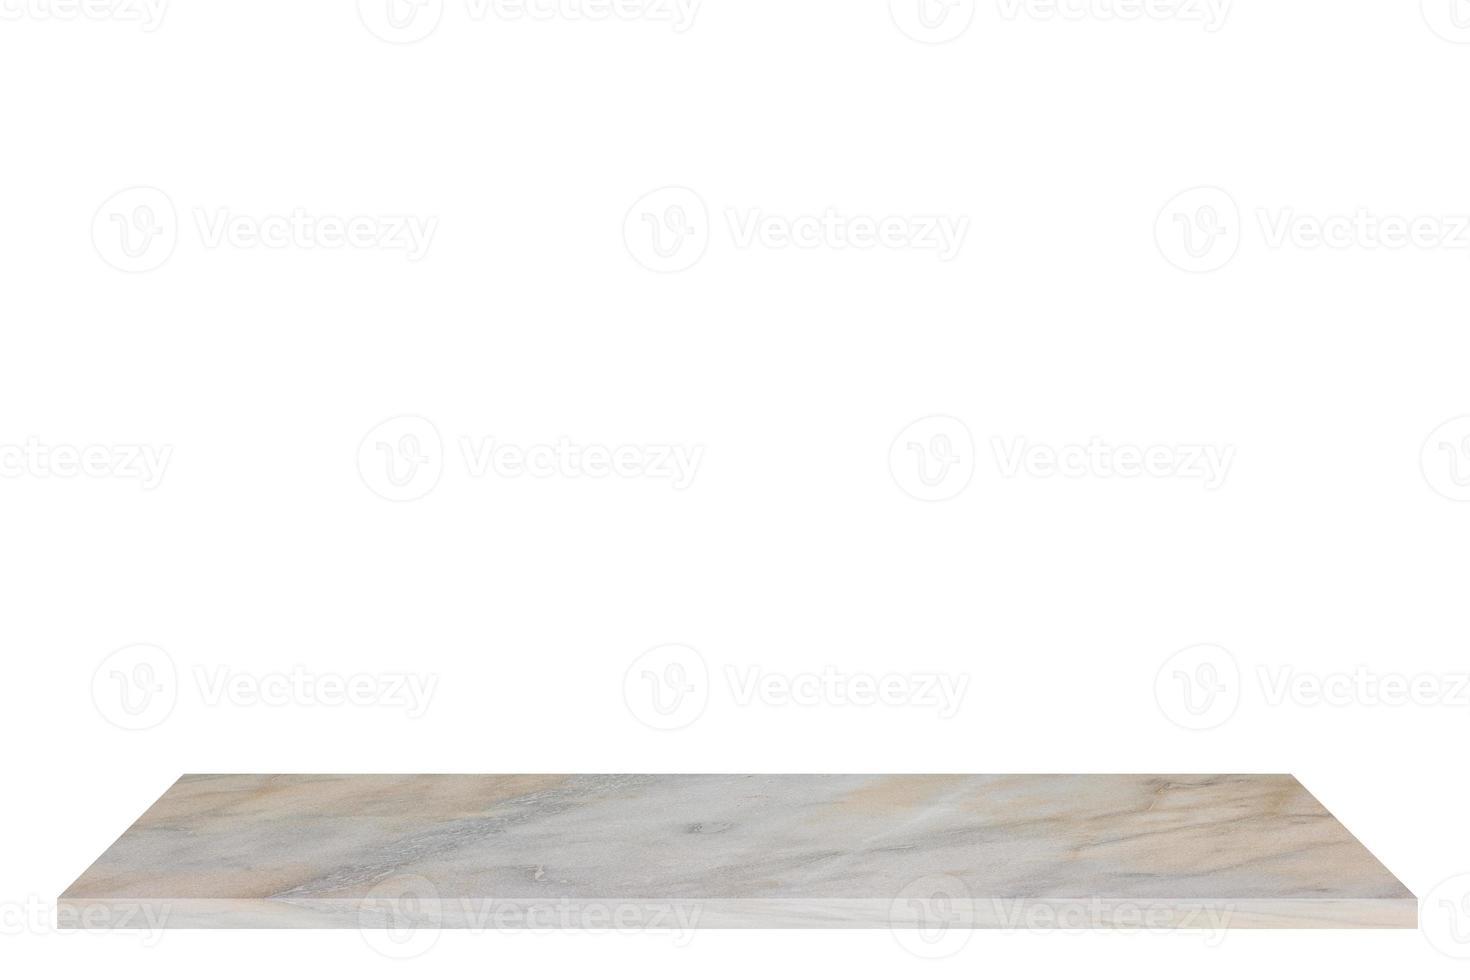 marbre blanc sur fond blanc photo